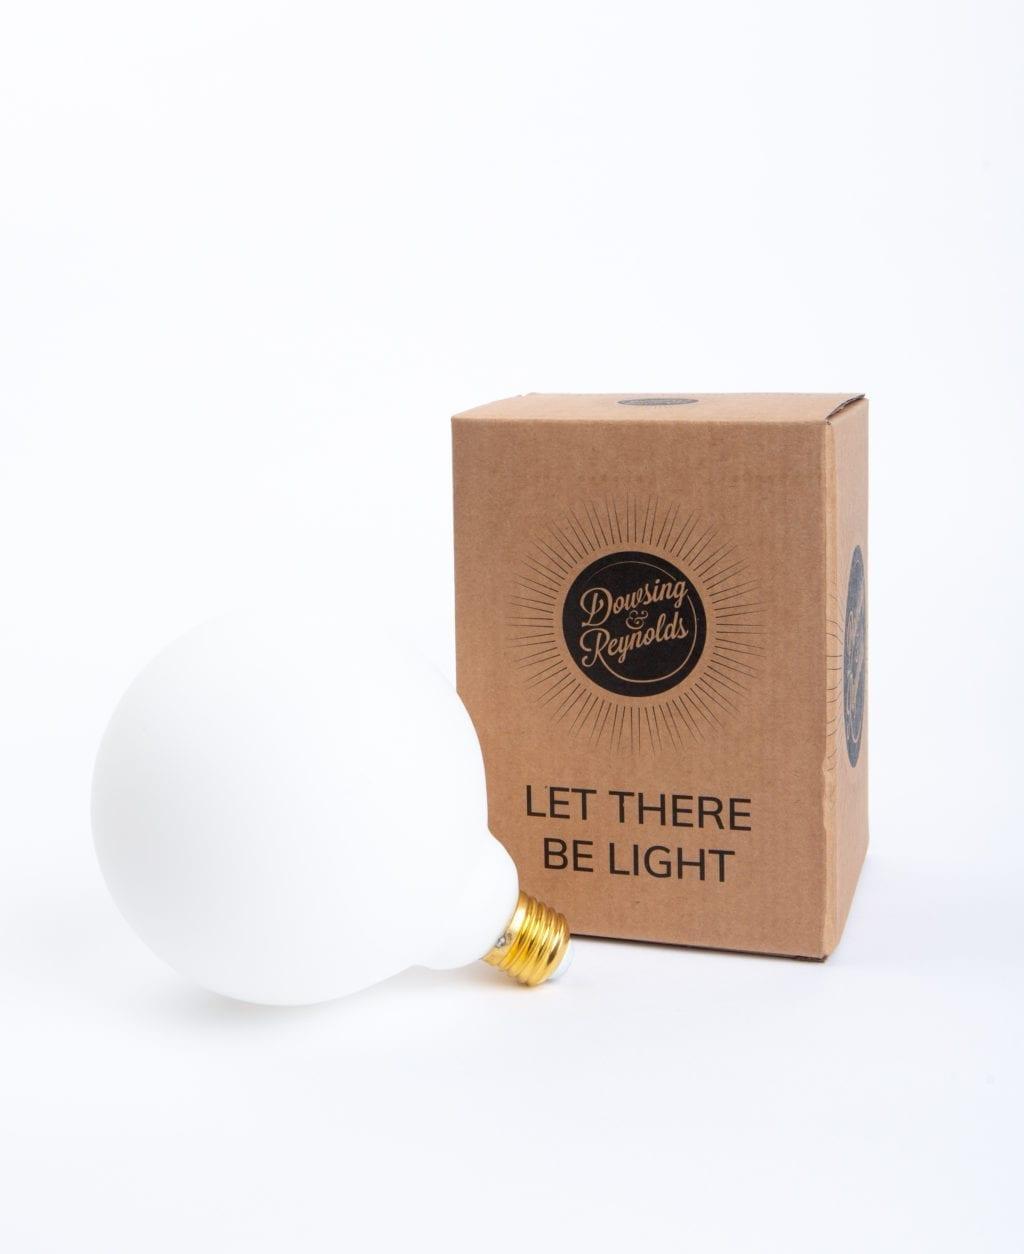 Aurora globe light bulb with cardboard box against white background